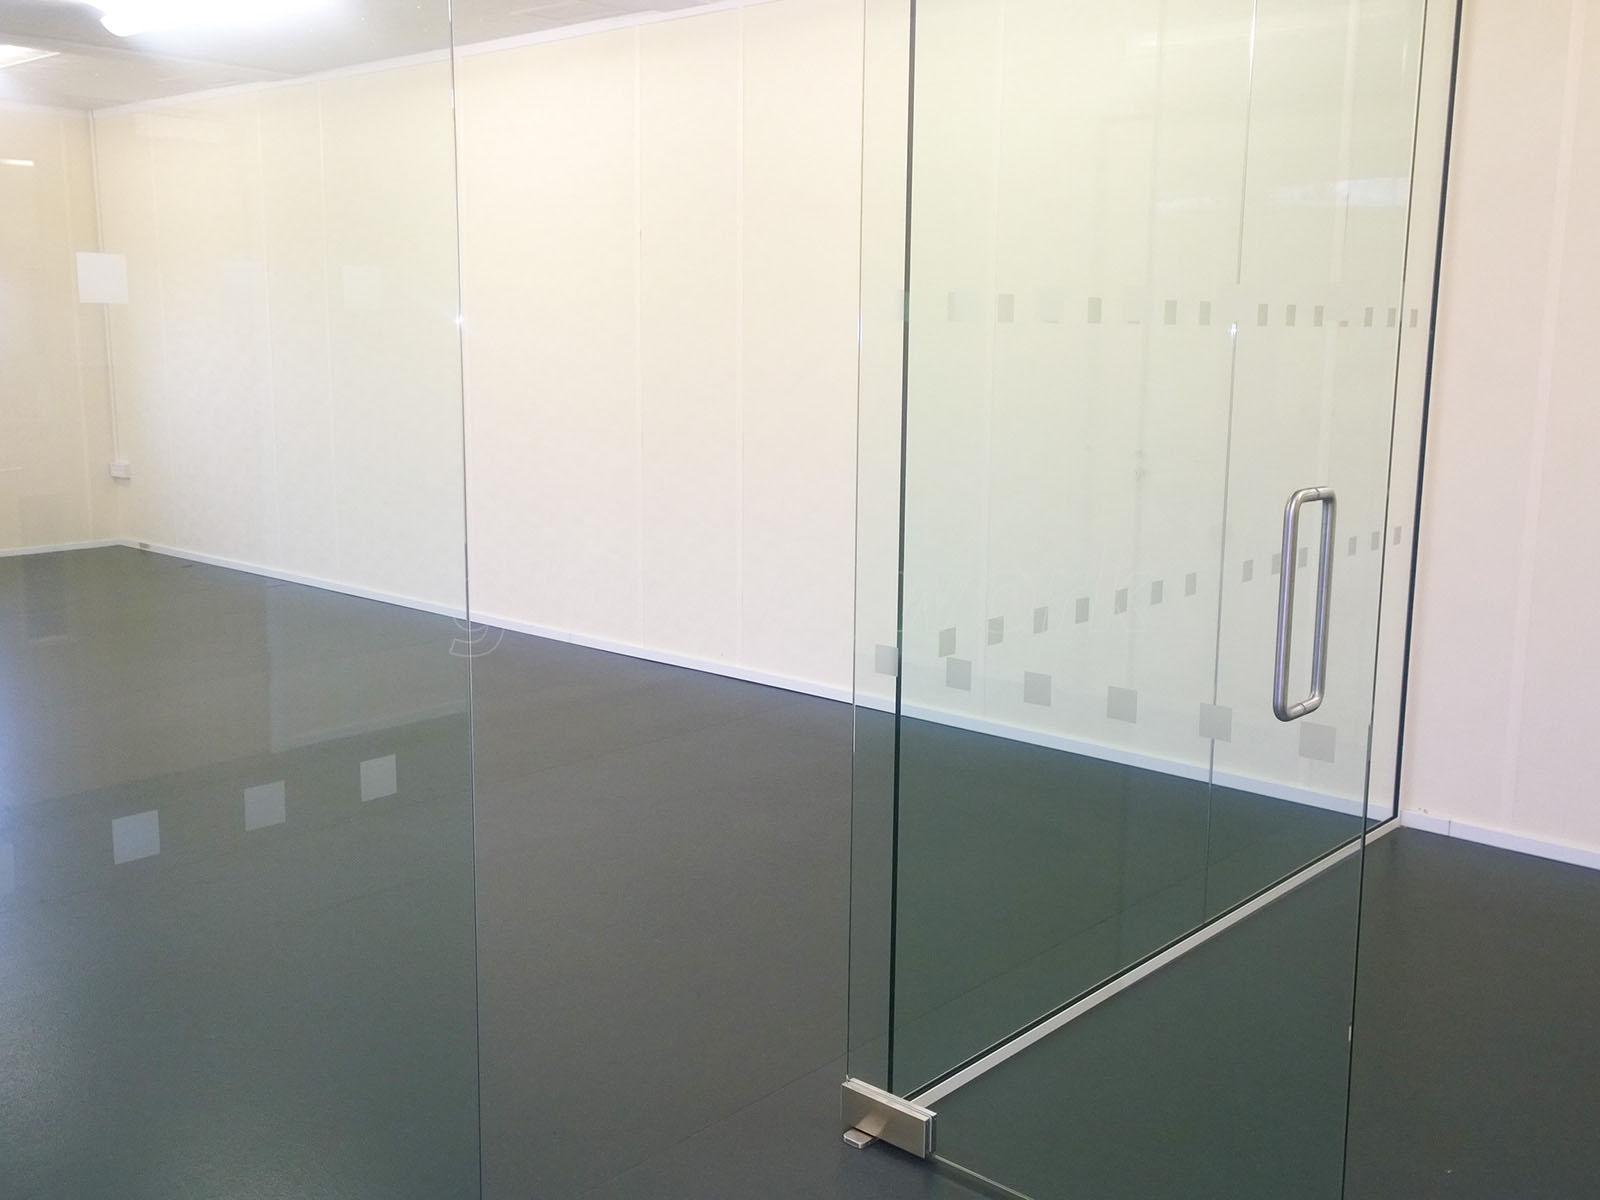 Petroc College (Barnstaple Devon) Frameless Glass Wall and Door & Glass Partitioning at Petroc College (Barnstaple Devon ...